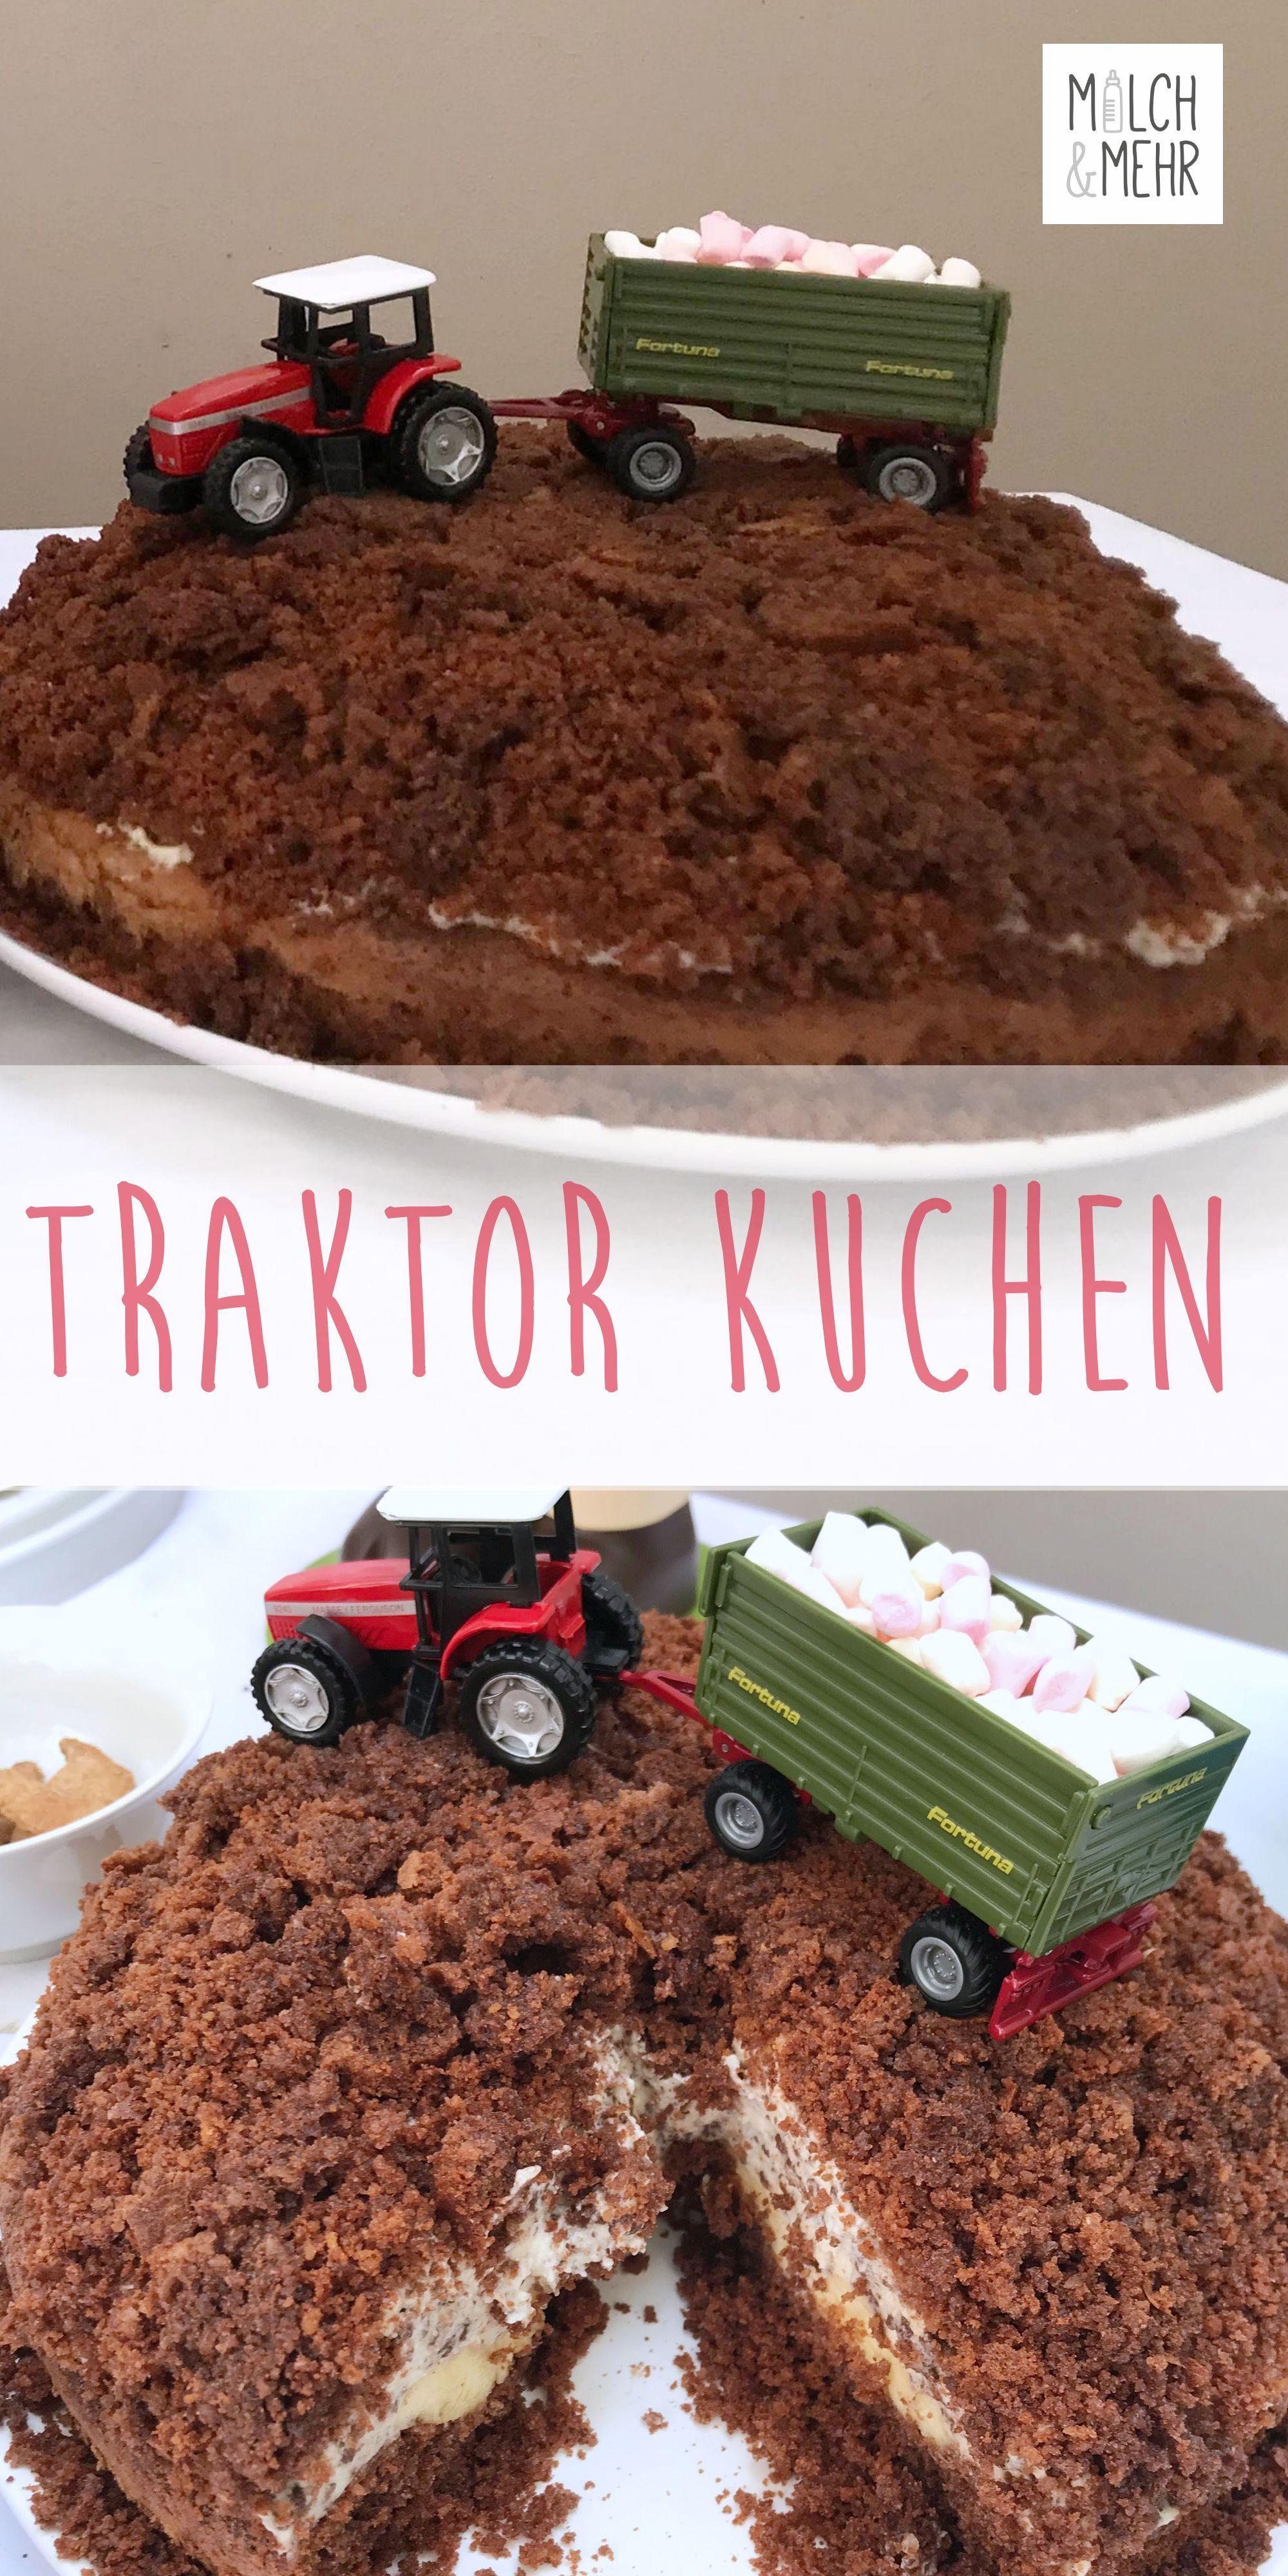 Traktor Kuchen Ohne Fondant Selina Vorspeisenrezept In 2020 Traktor Kuchen Kuchen Mit Fondant Kuchen Kindergeburtstag Traktor